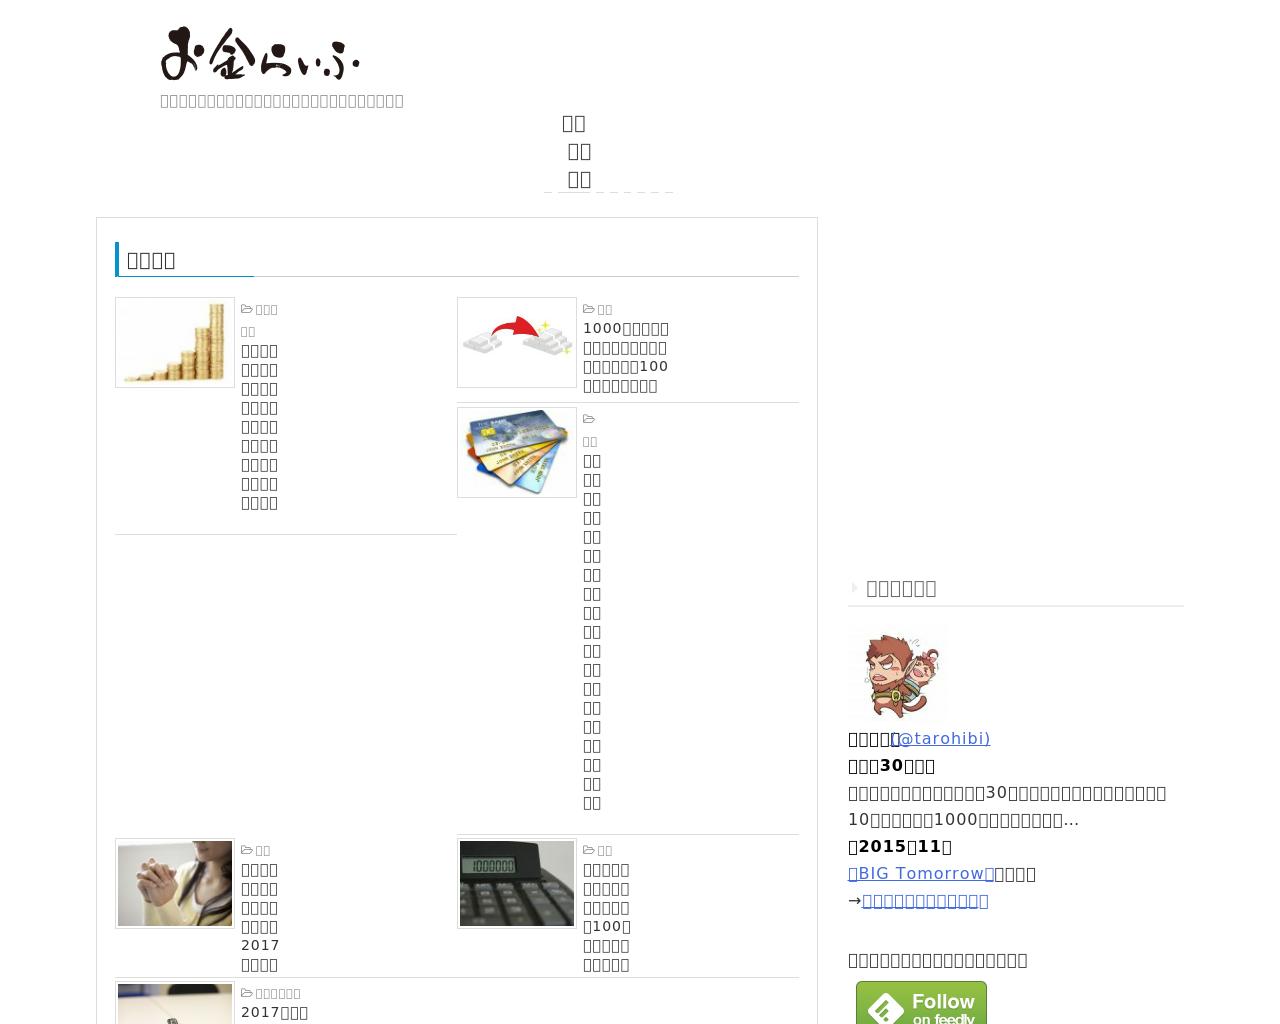 Tarohibi.com-Advertising-Reviews-Pricing